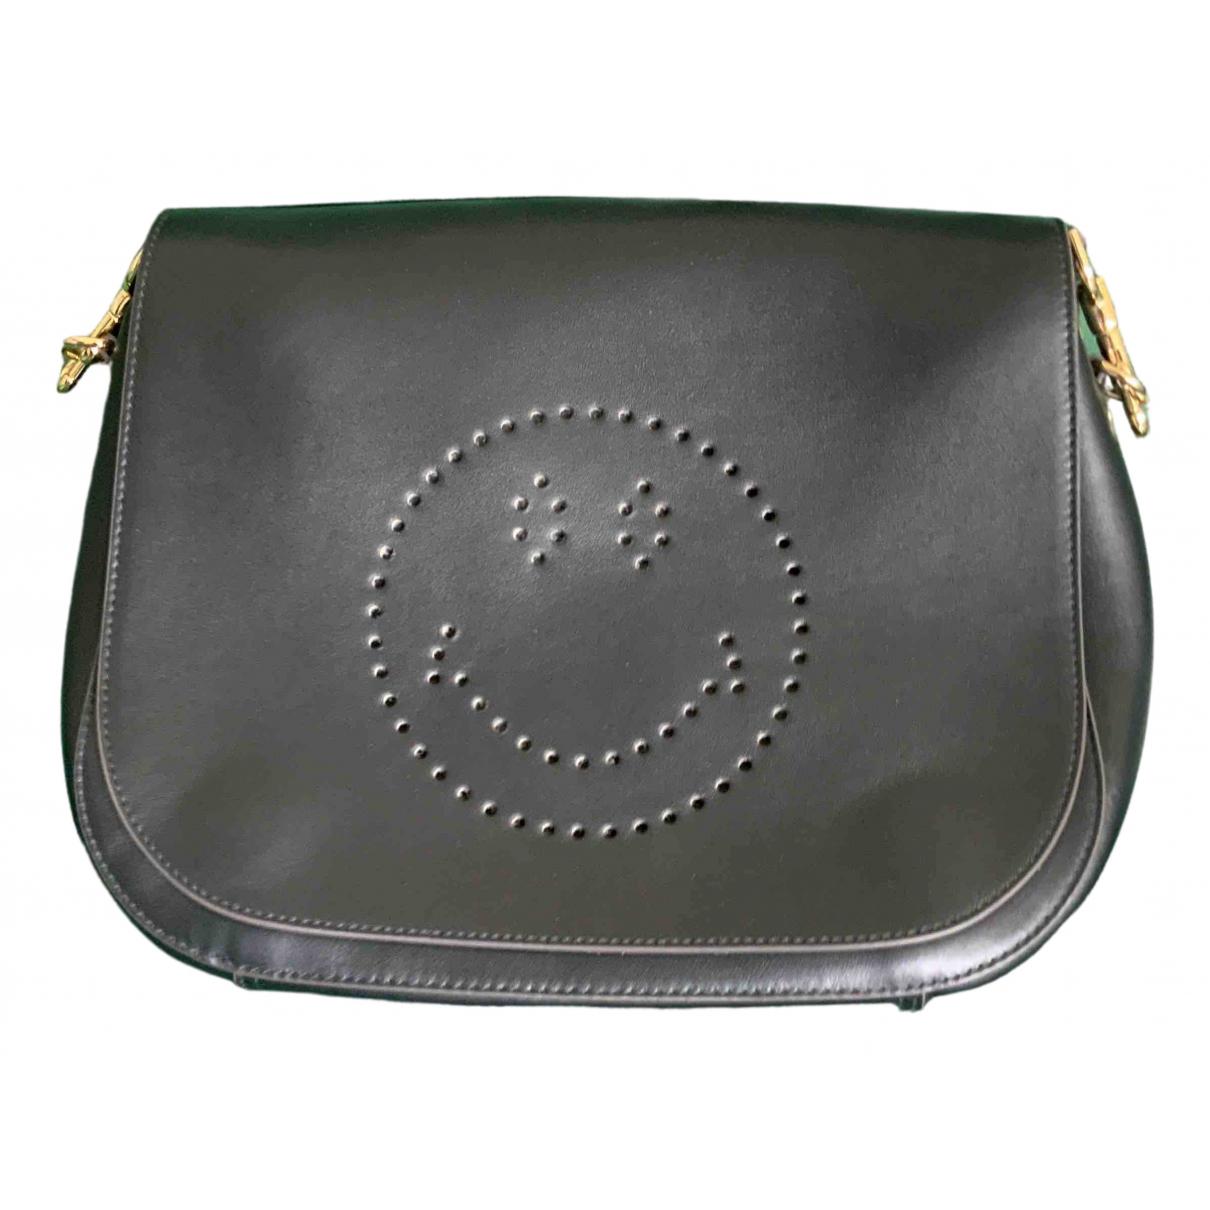 Anya Hindmarch Ebury Maxi  Black Leather handbag for Women \N